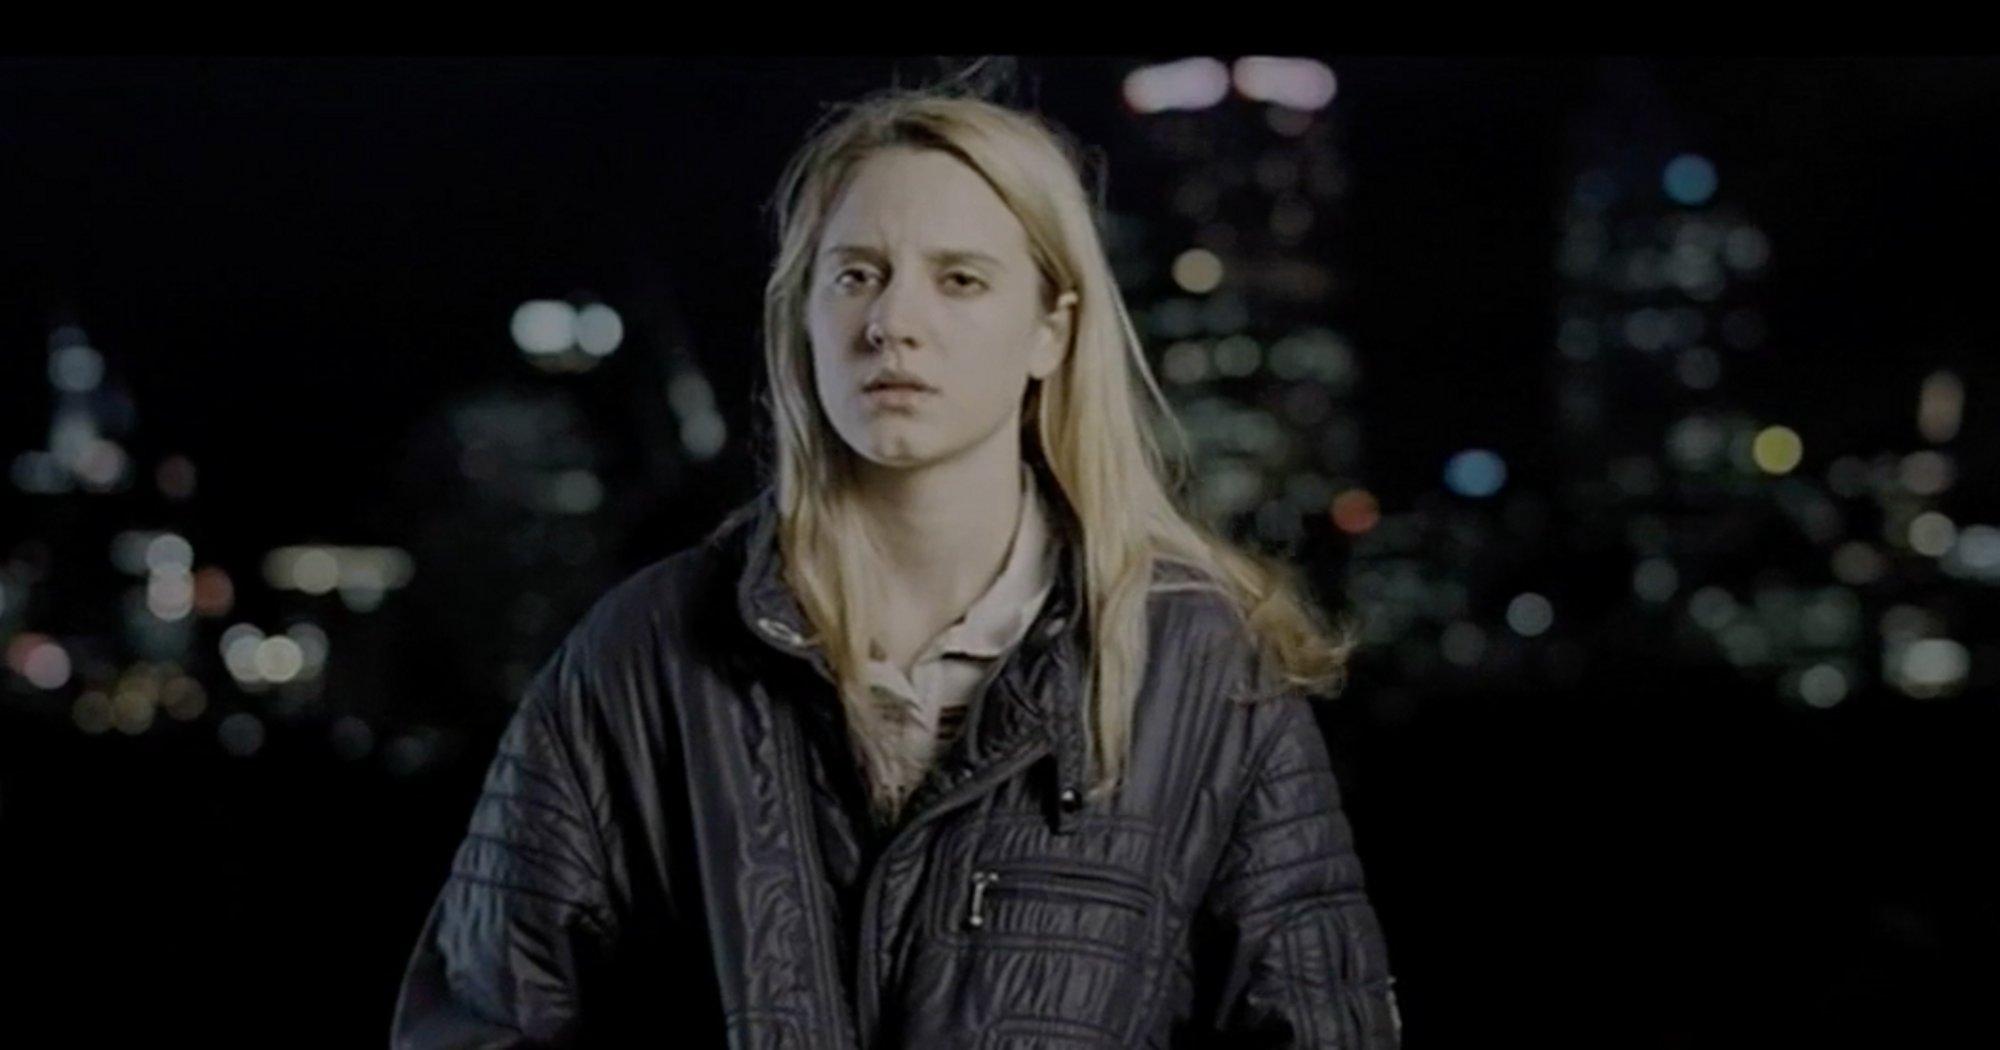 Molly Tarlov,Michaela Conlin Adult pics & movies Angel Parker,Jackie Tohn